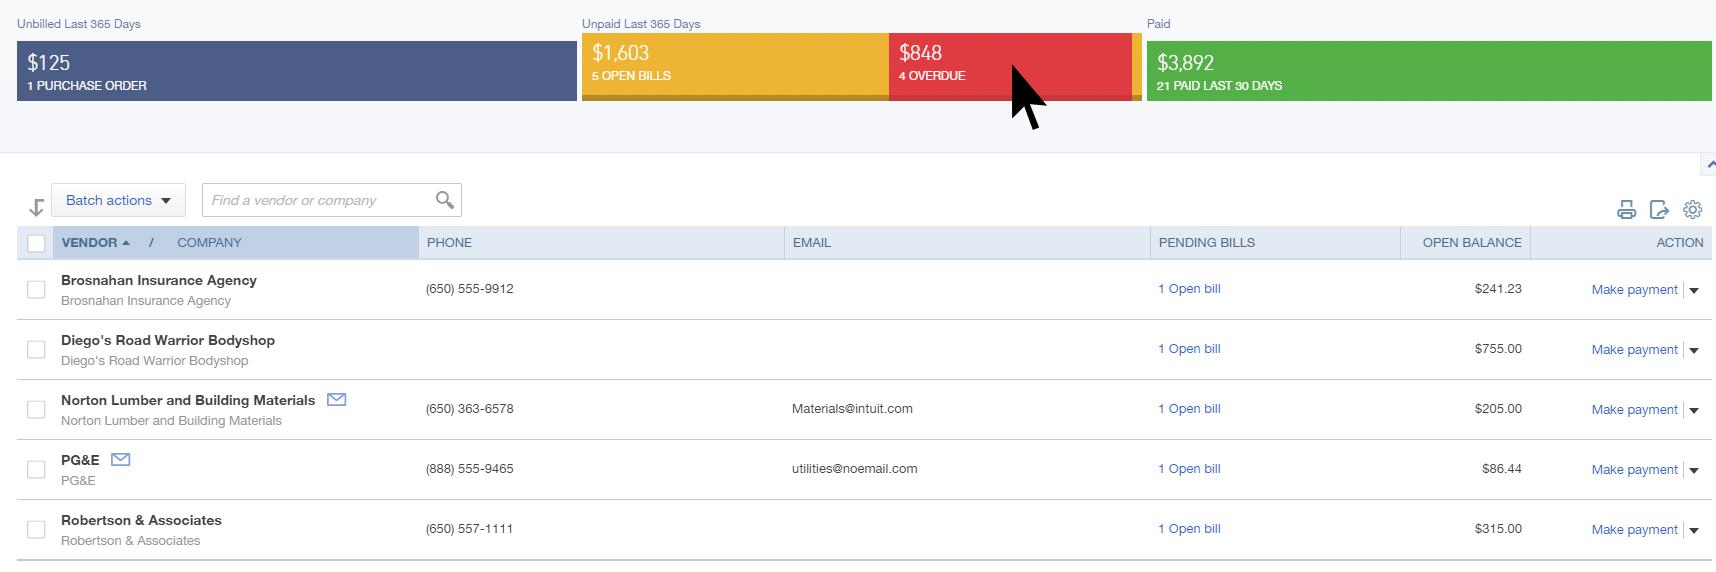 QuickBooks Online Vendor Bar to Pay Bills